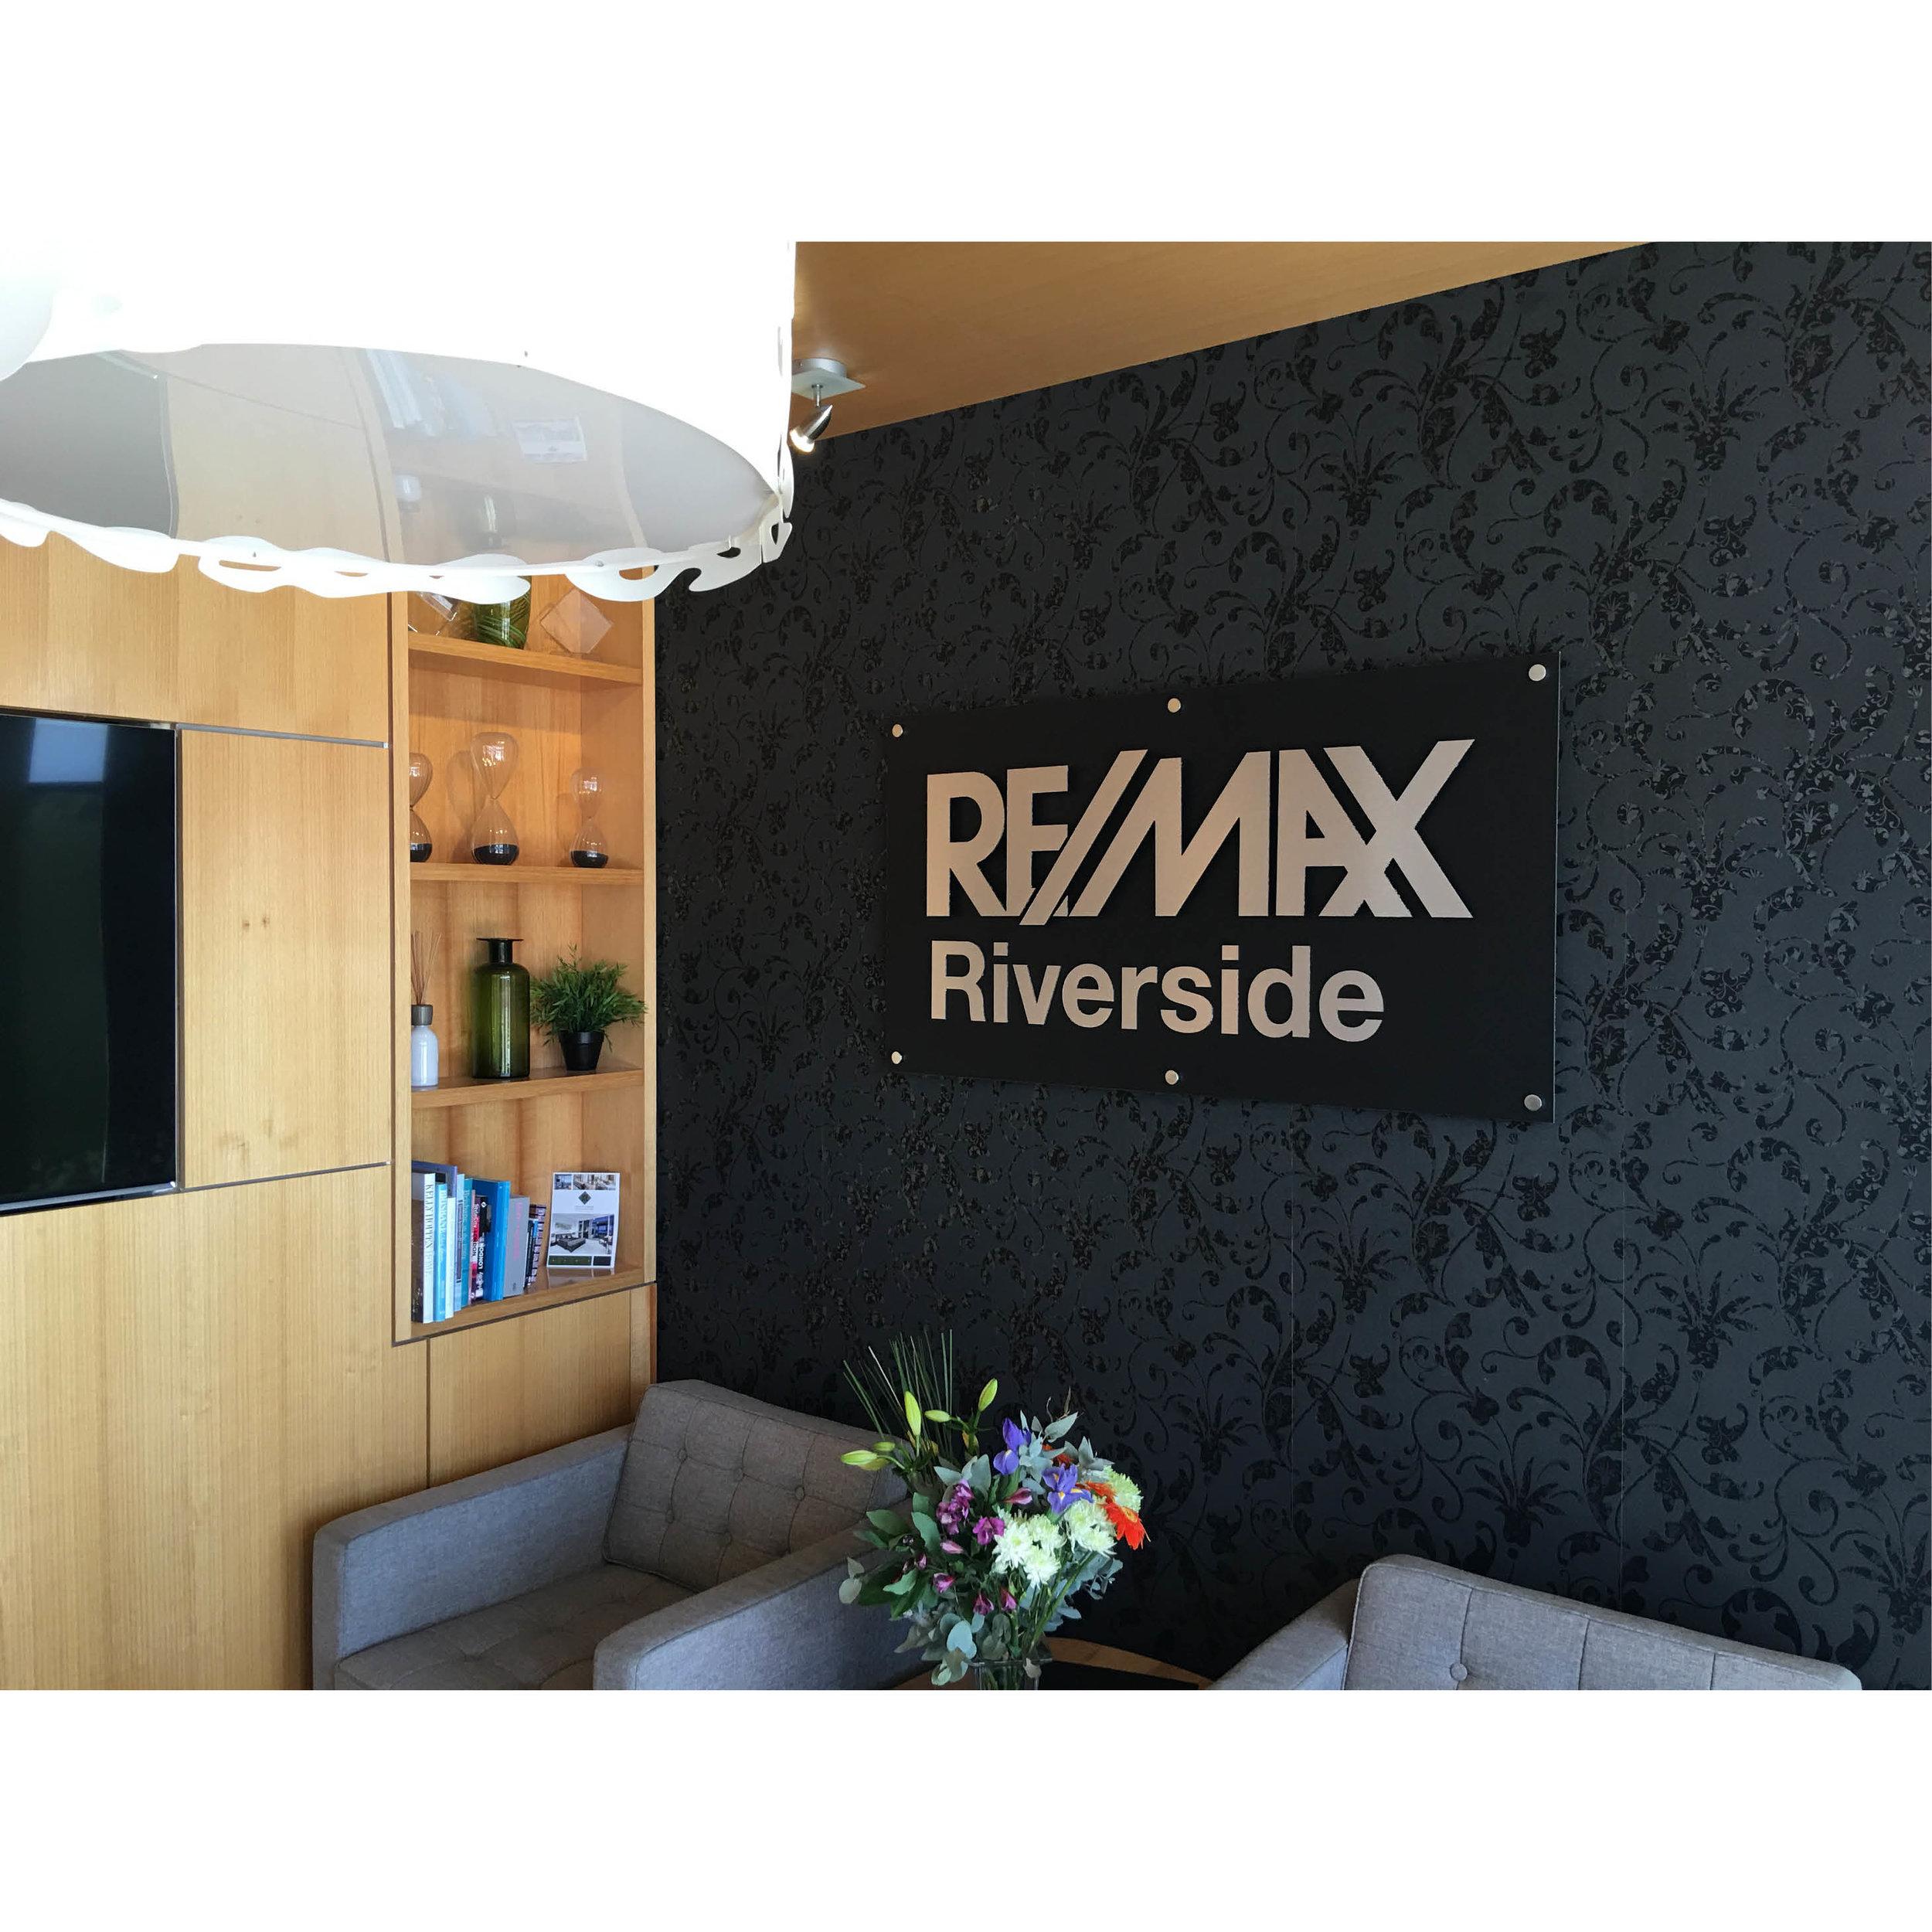 Riverside - Behance 1712.jpg